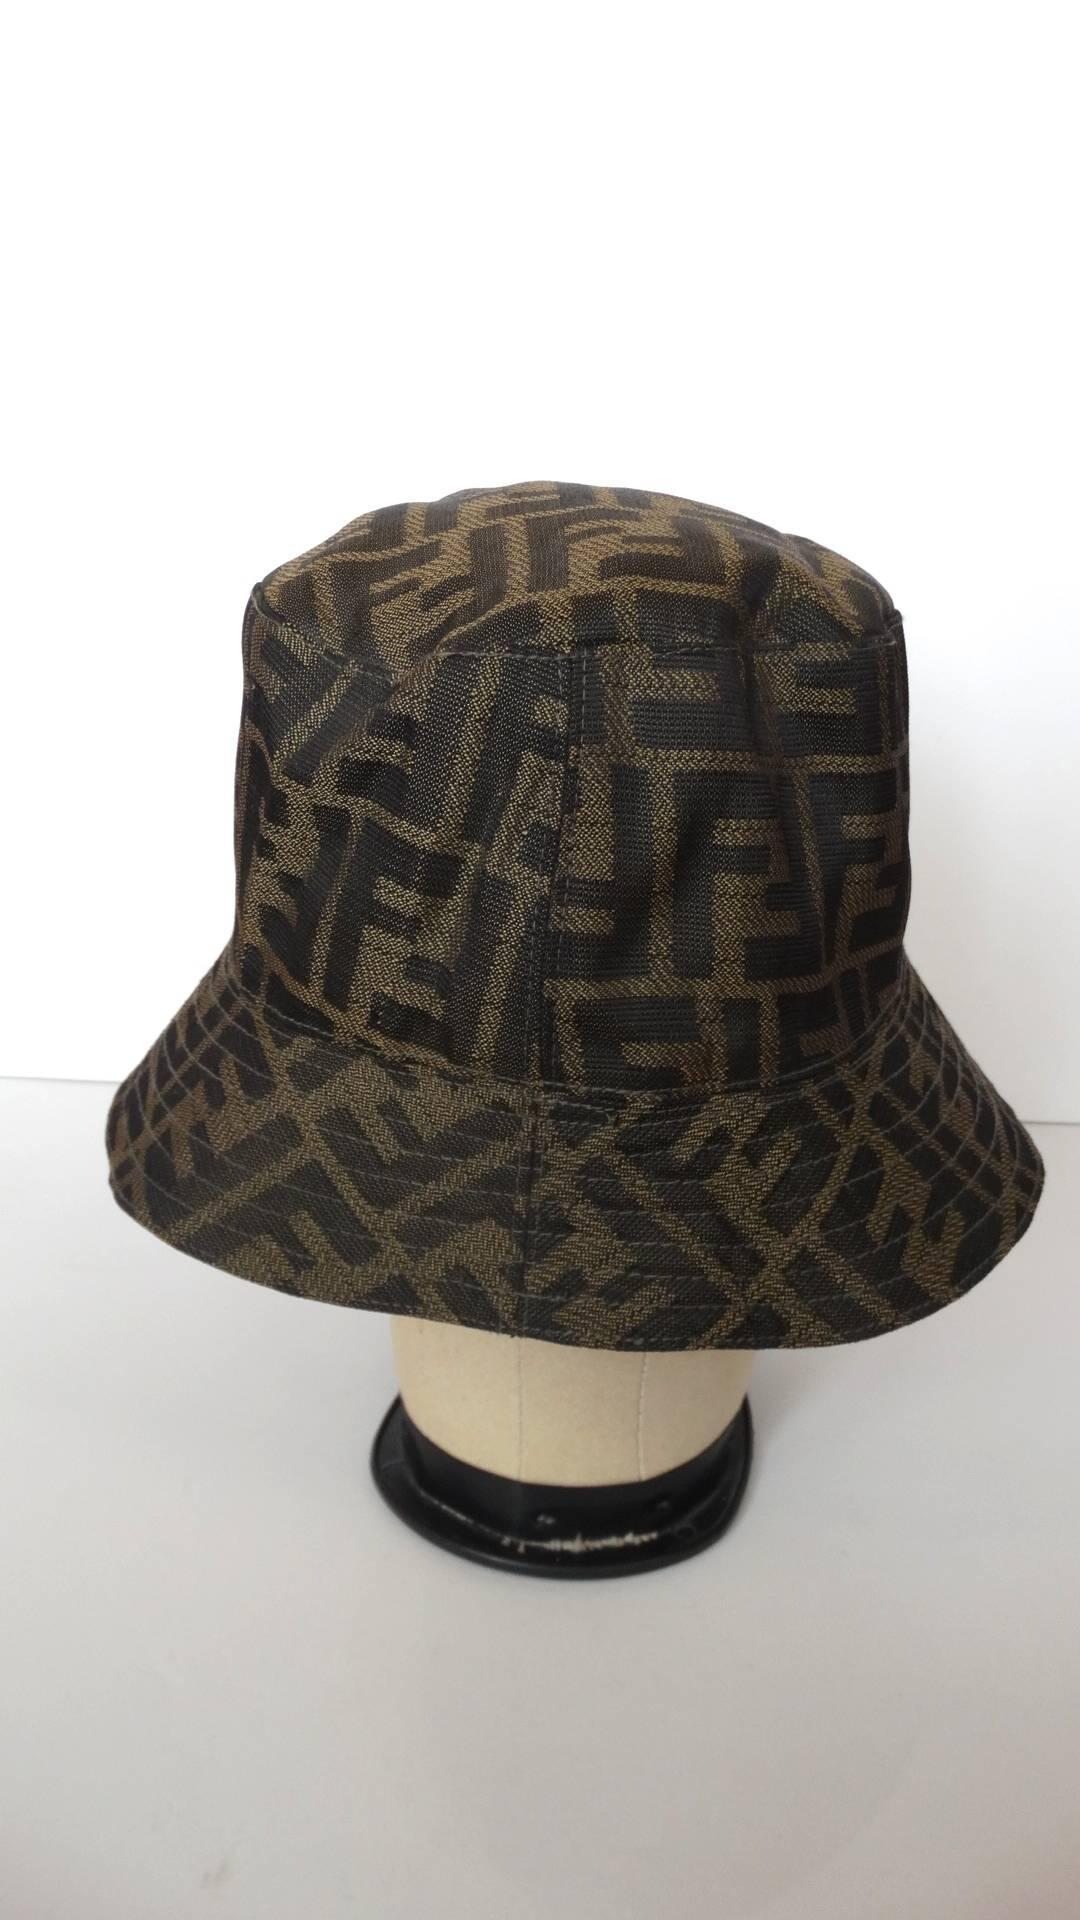 Fendi zucca monogram bucket hat at stdibs jpg 1500x2667 Fendi bucket hat 7d0662296309